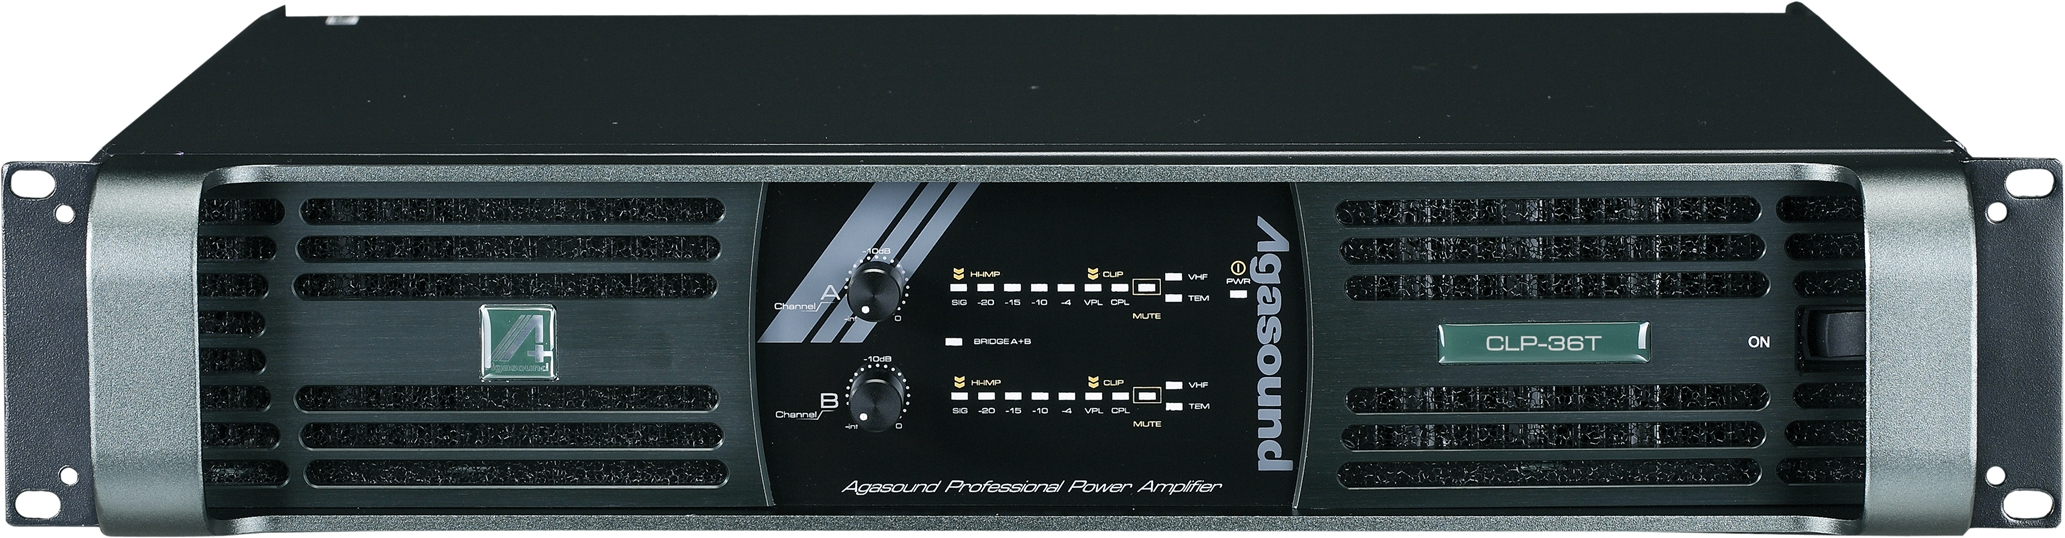 Công suất Agasound CLP-36T